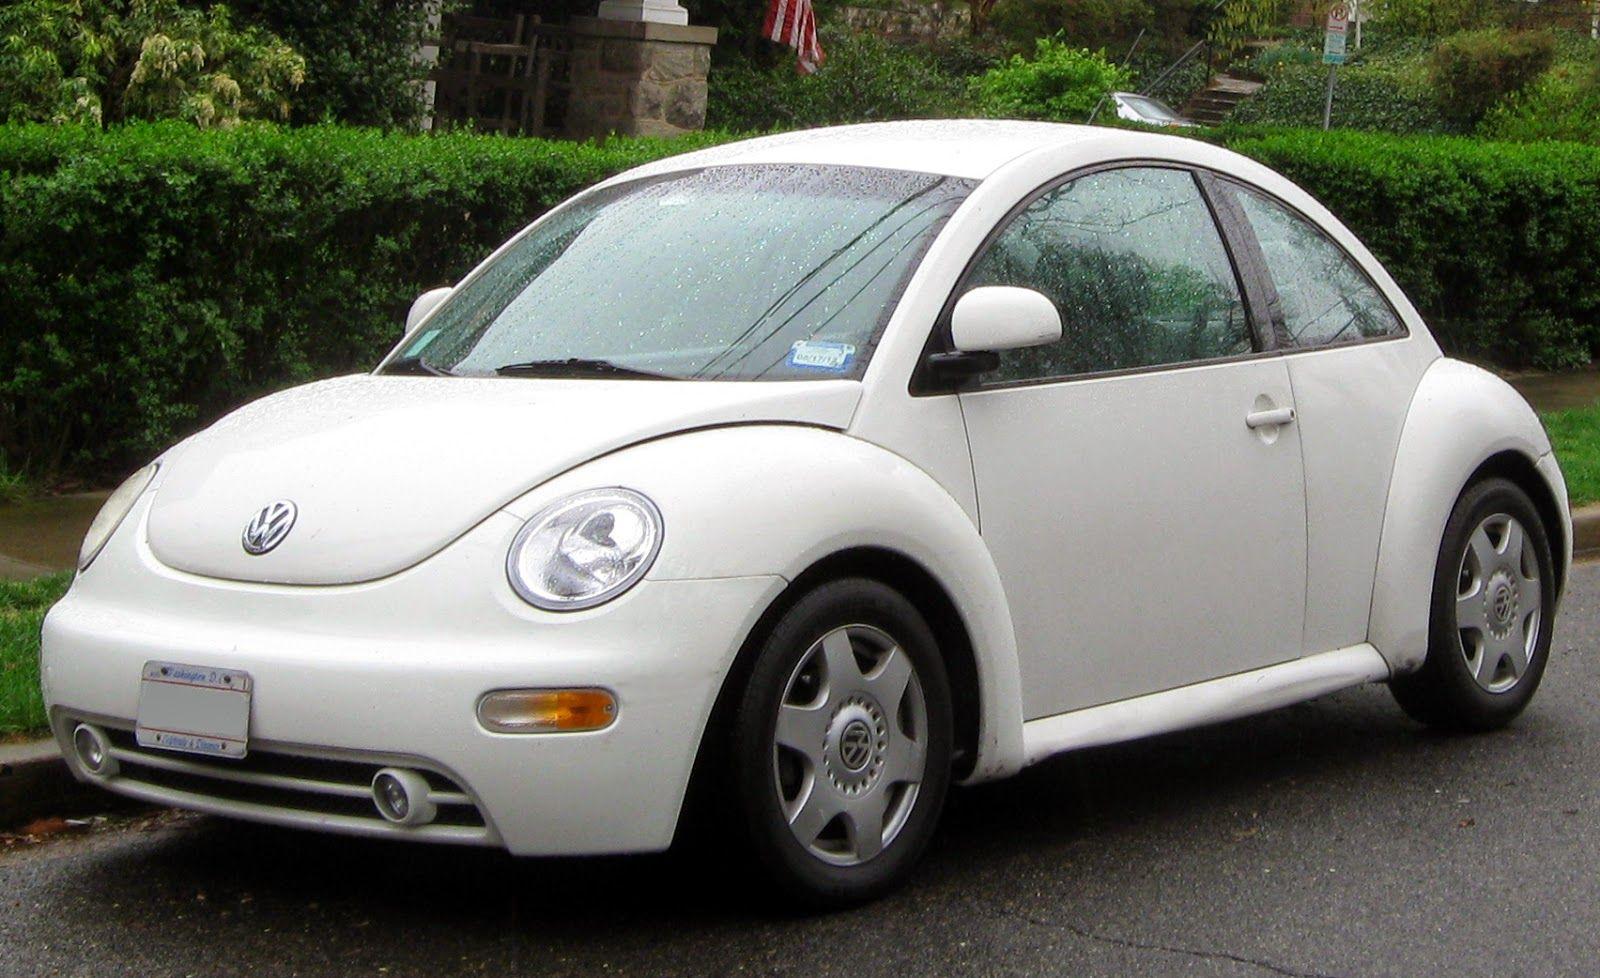 1998 Vw Beetle Owners Manual Vw Owners Manual Volkswagen New Beetle Volkswagen Beetle Vw New Beetle